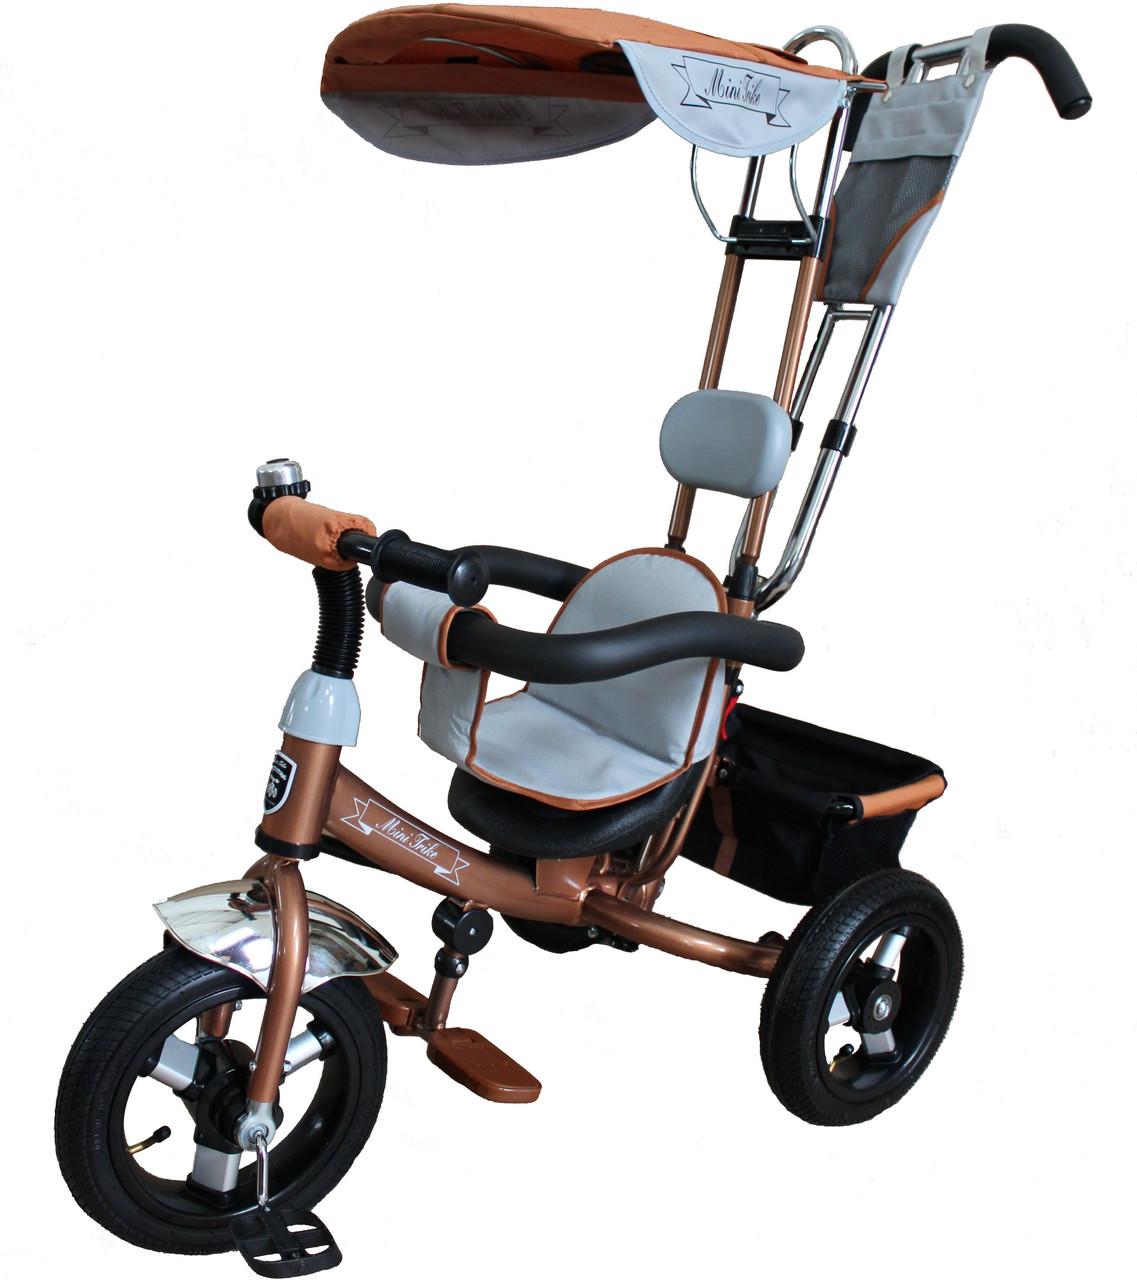 Детский велосипед трехколесный Mars Mini Trike LT950 air шоколад